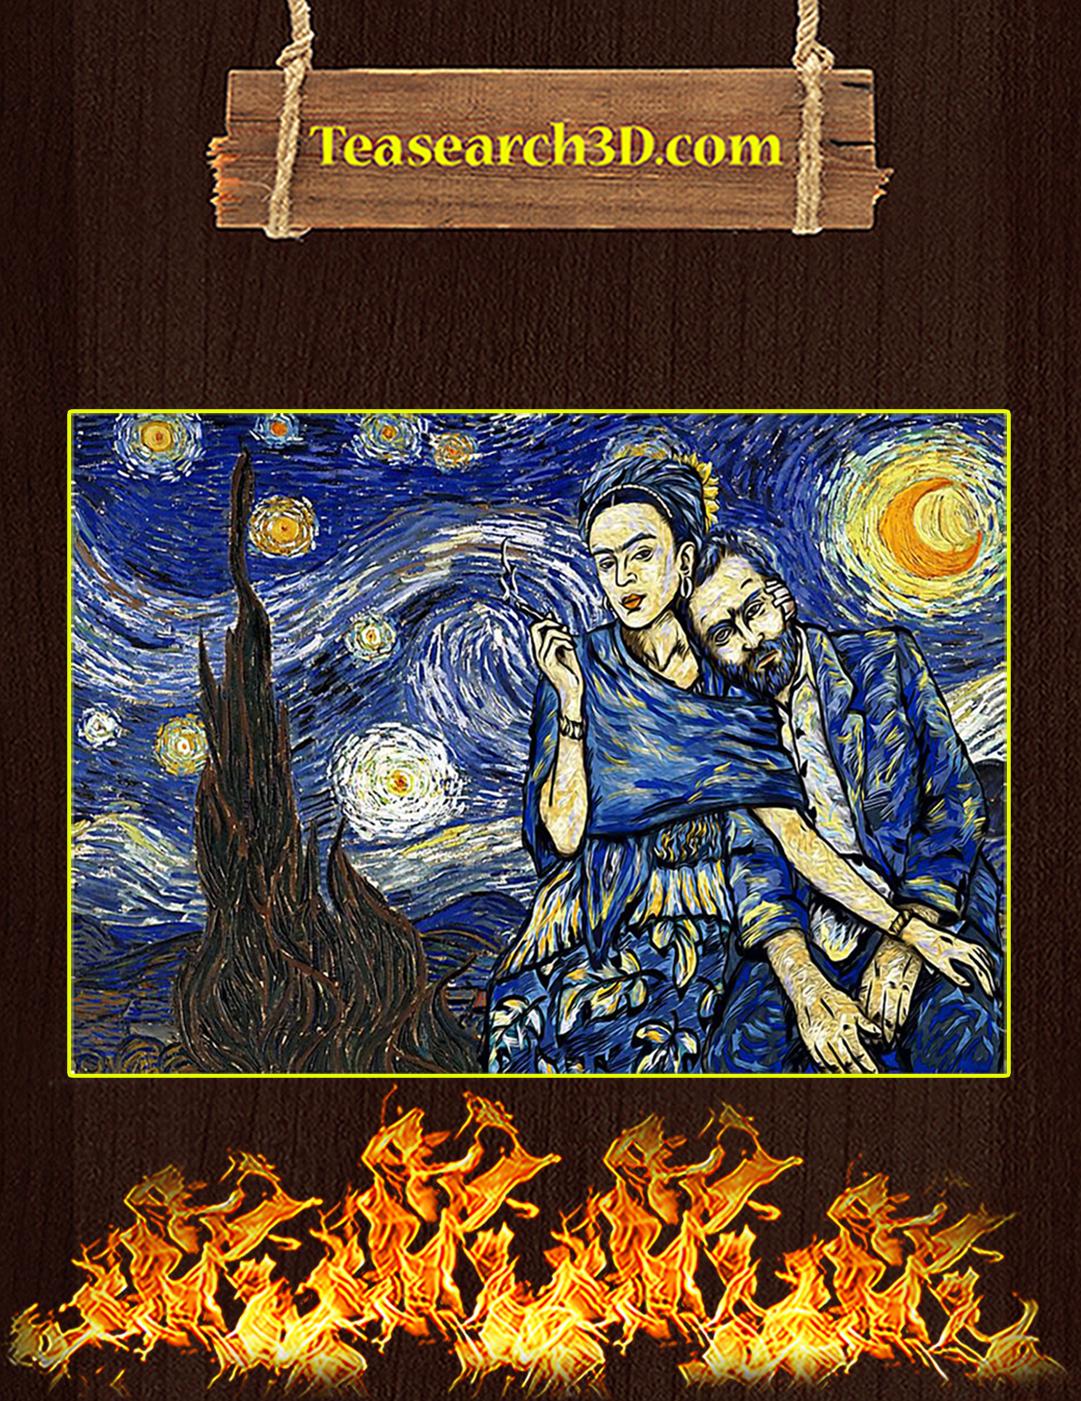 Frida Kahlo Van Gogh Starry Night Poster A2